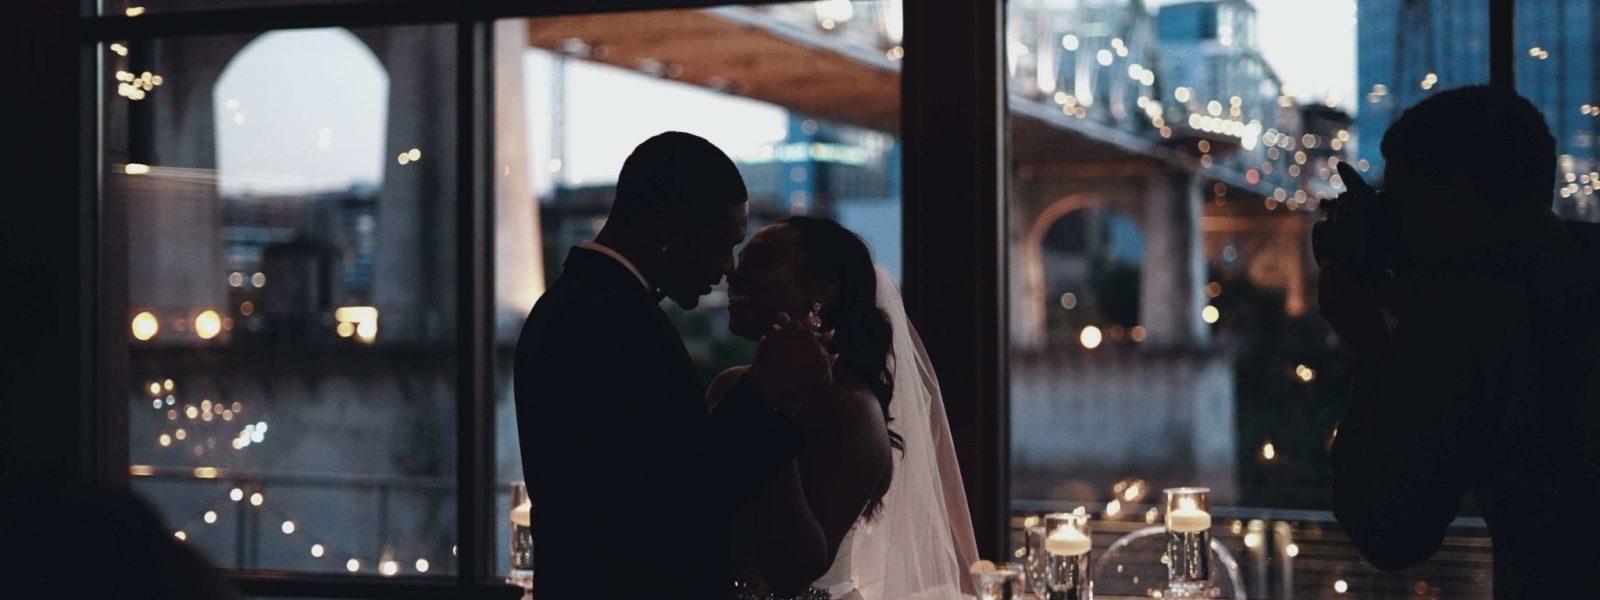 couple-wedding-day-photographer-photo-party-restaurant-dance-move-man-woman